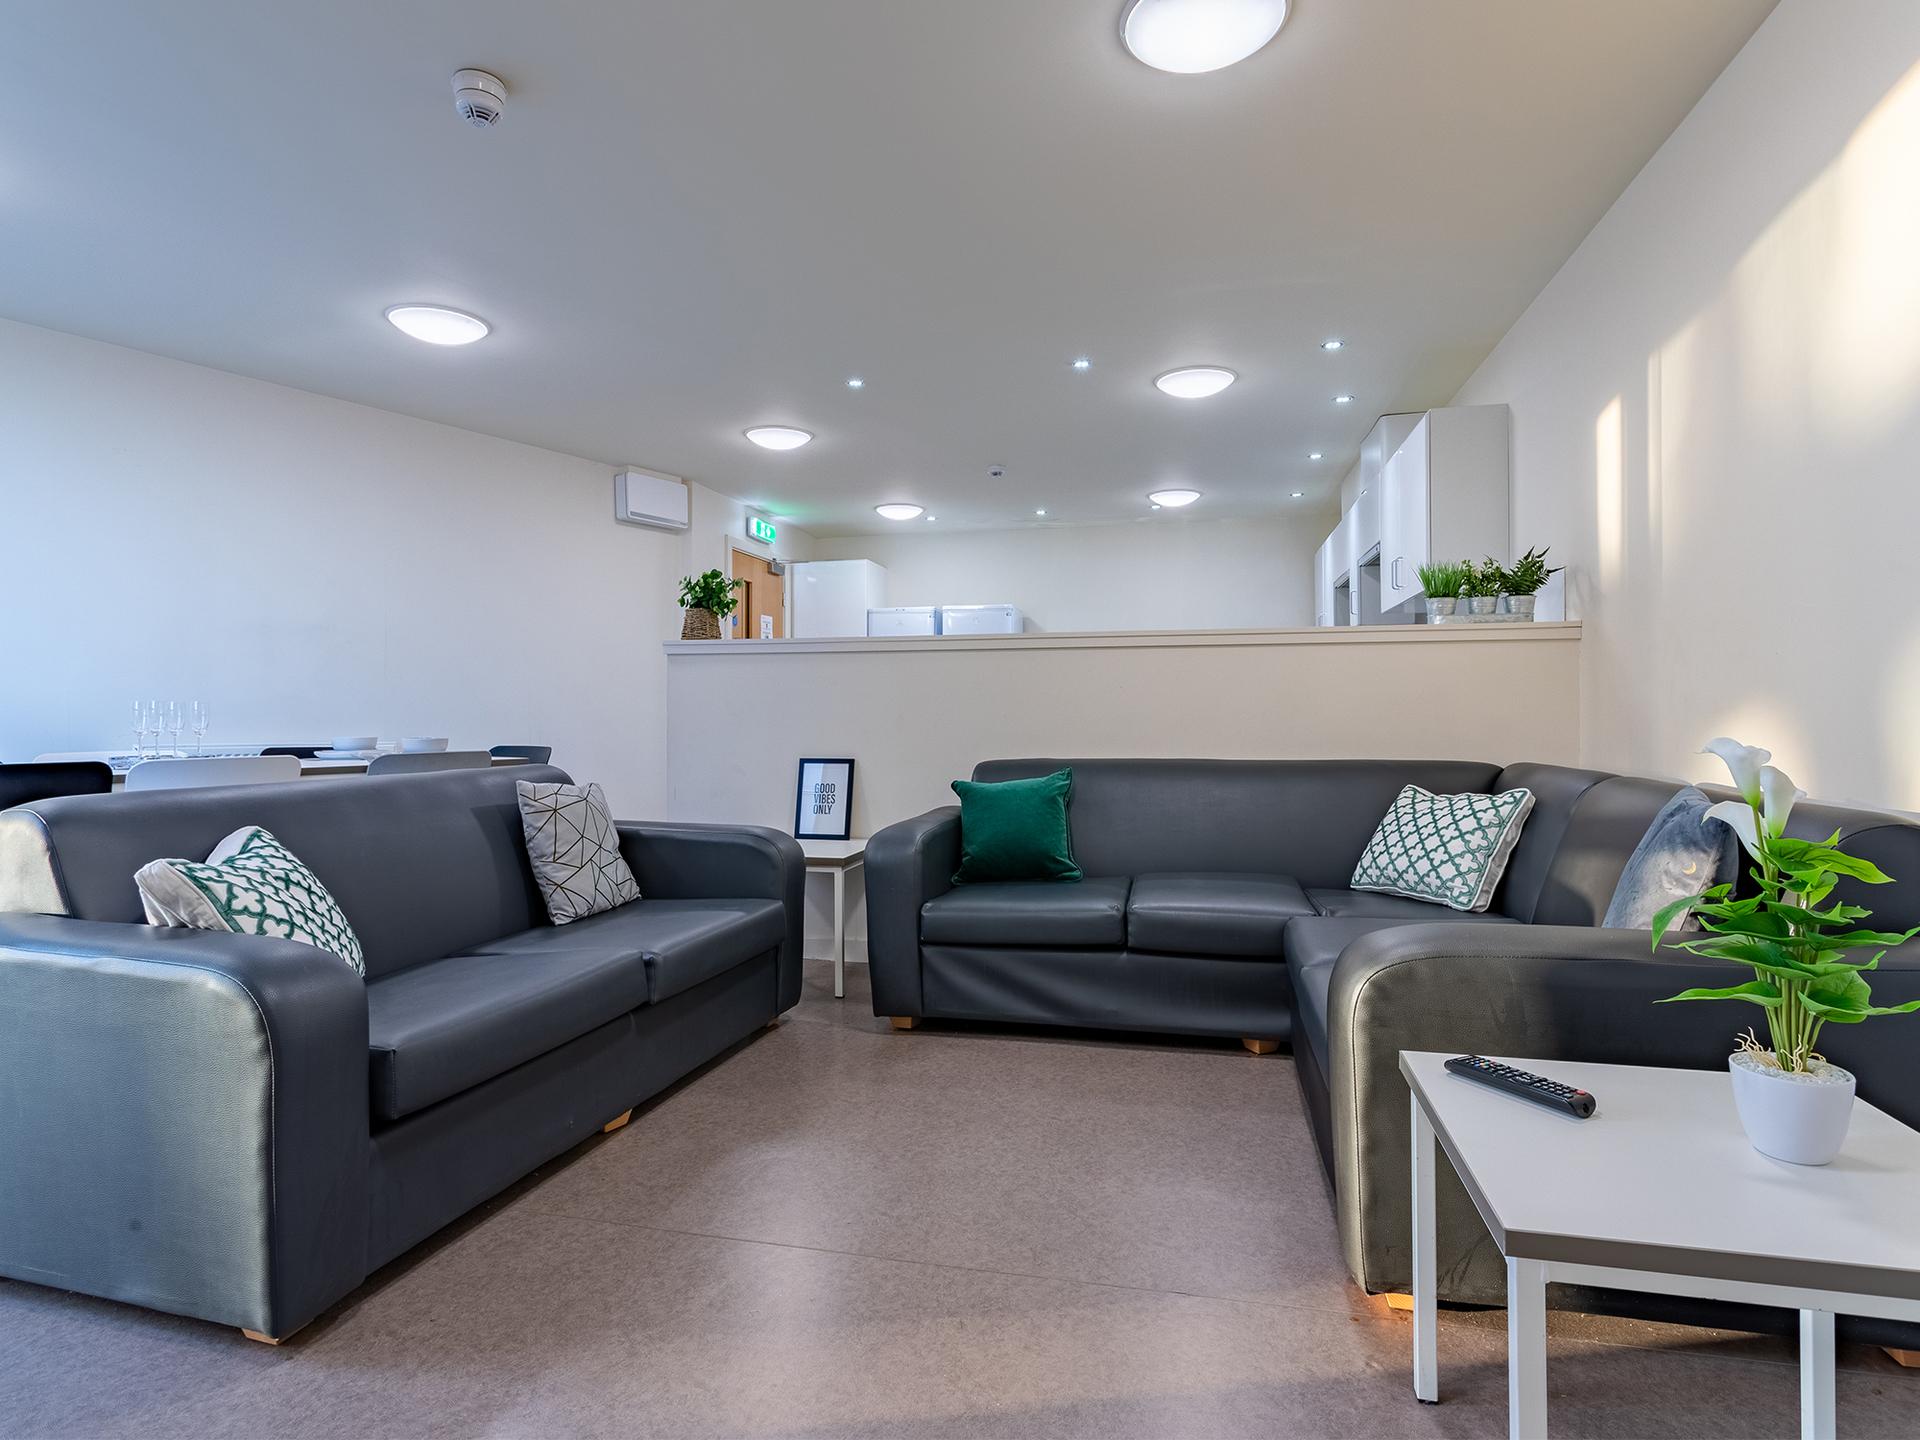 Student Accommodation Aberdeen Shared Kitchen